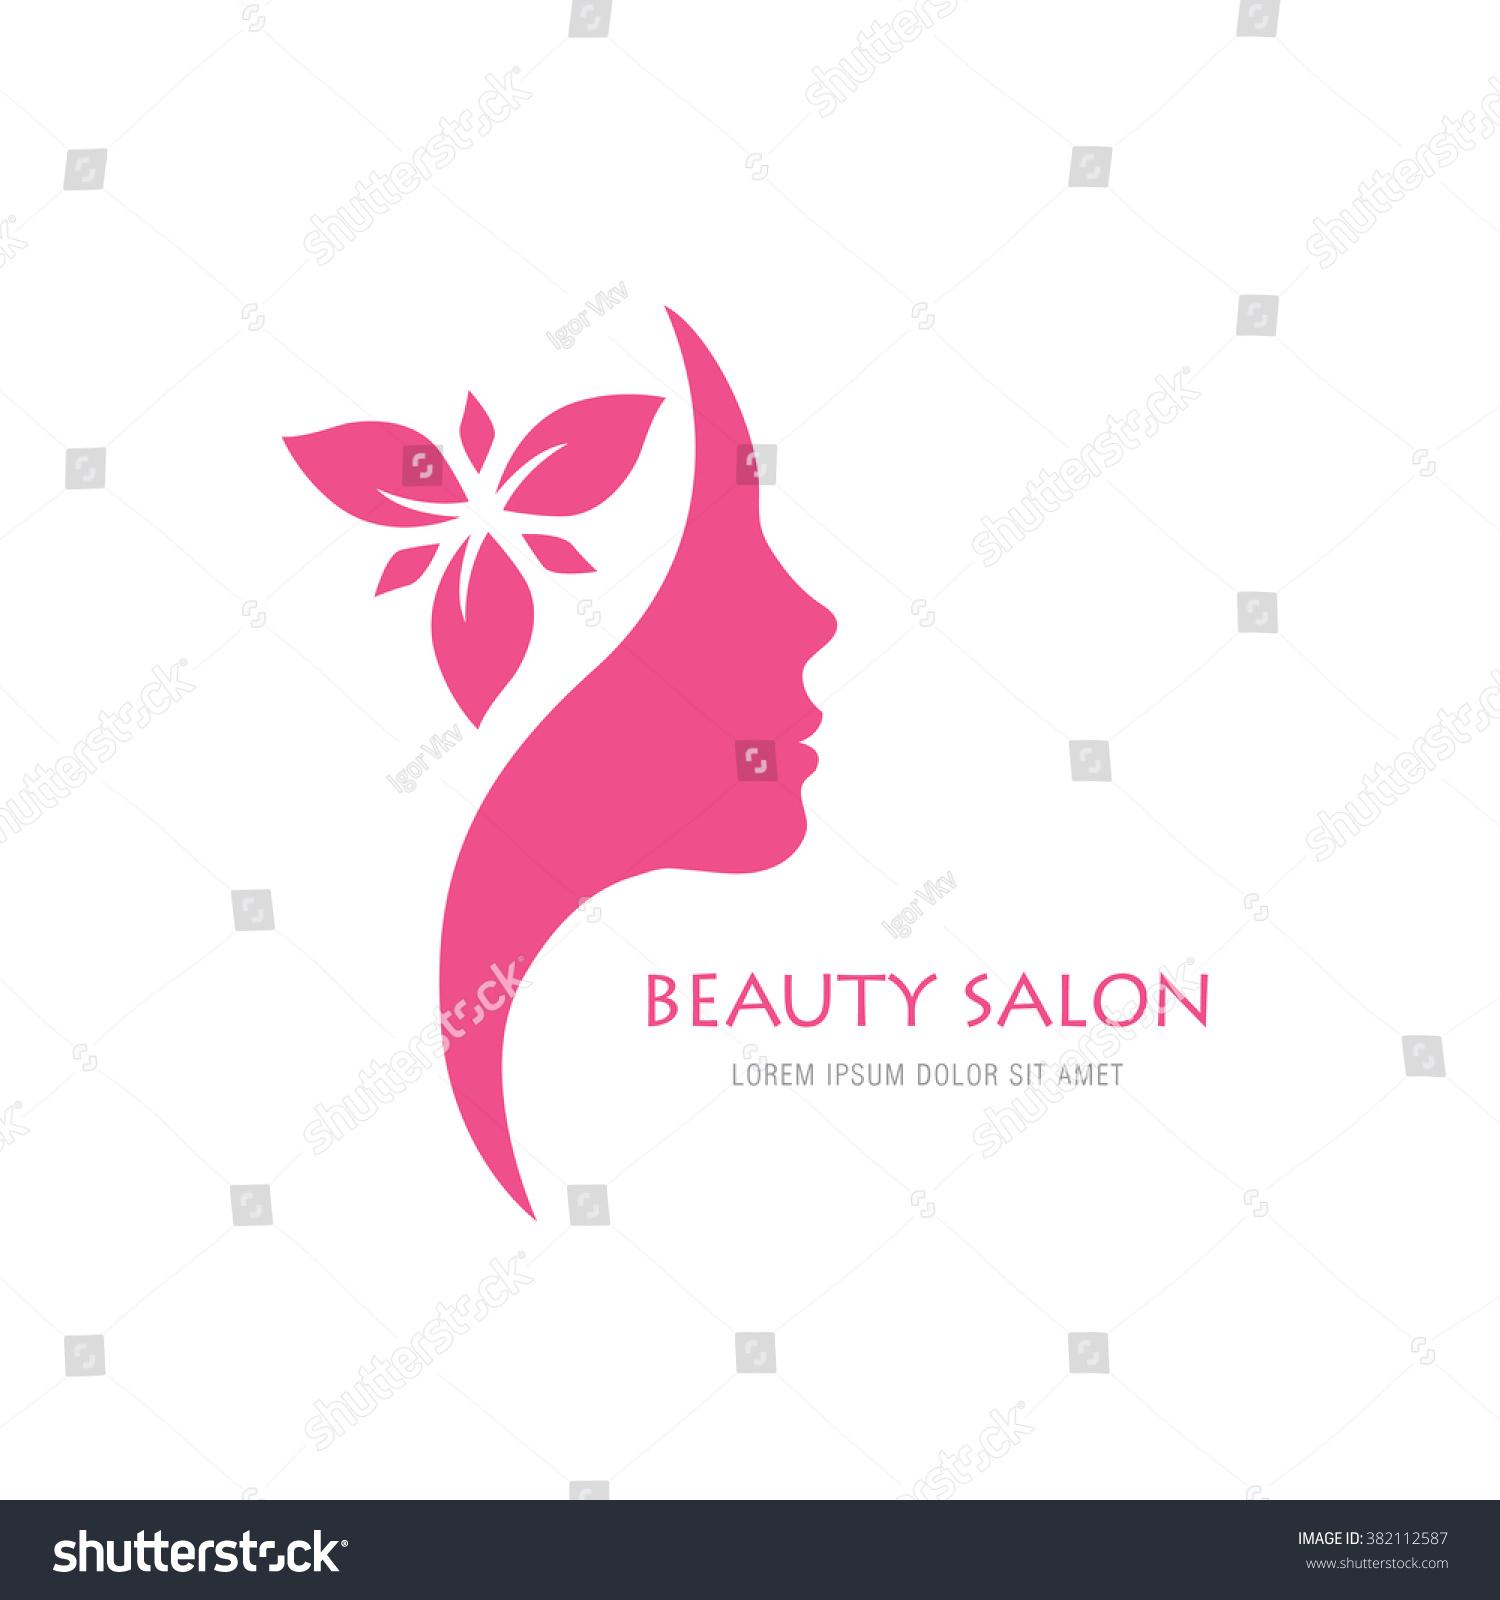 Beauty Salon And Spa Concept